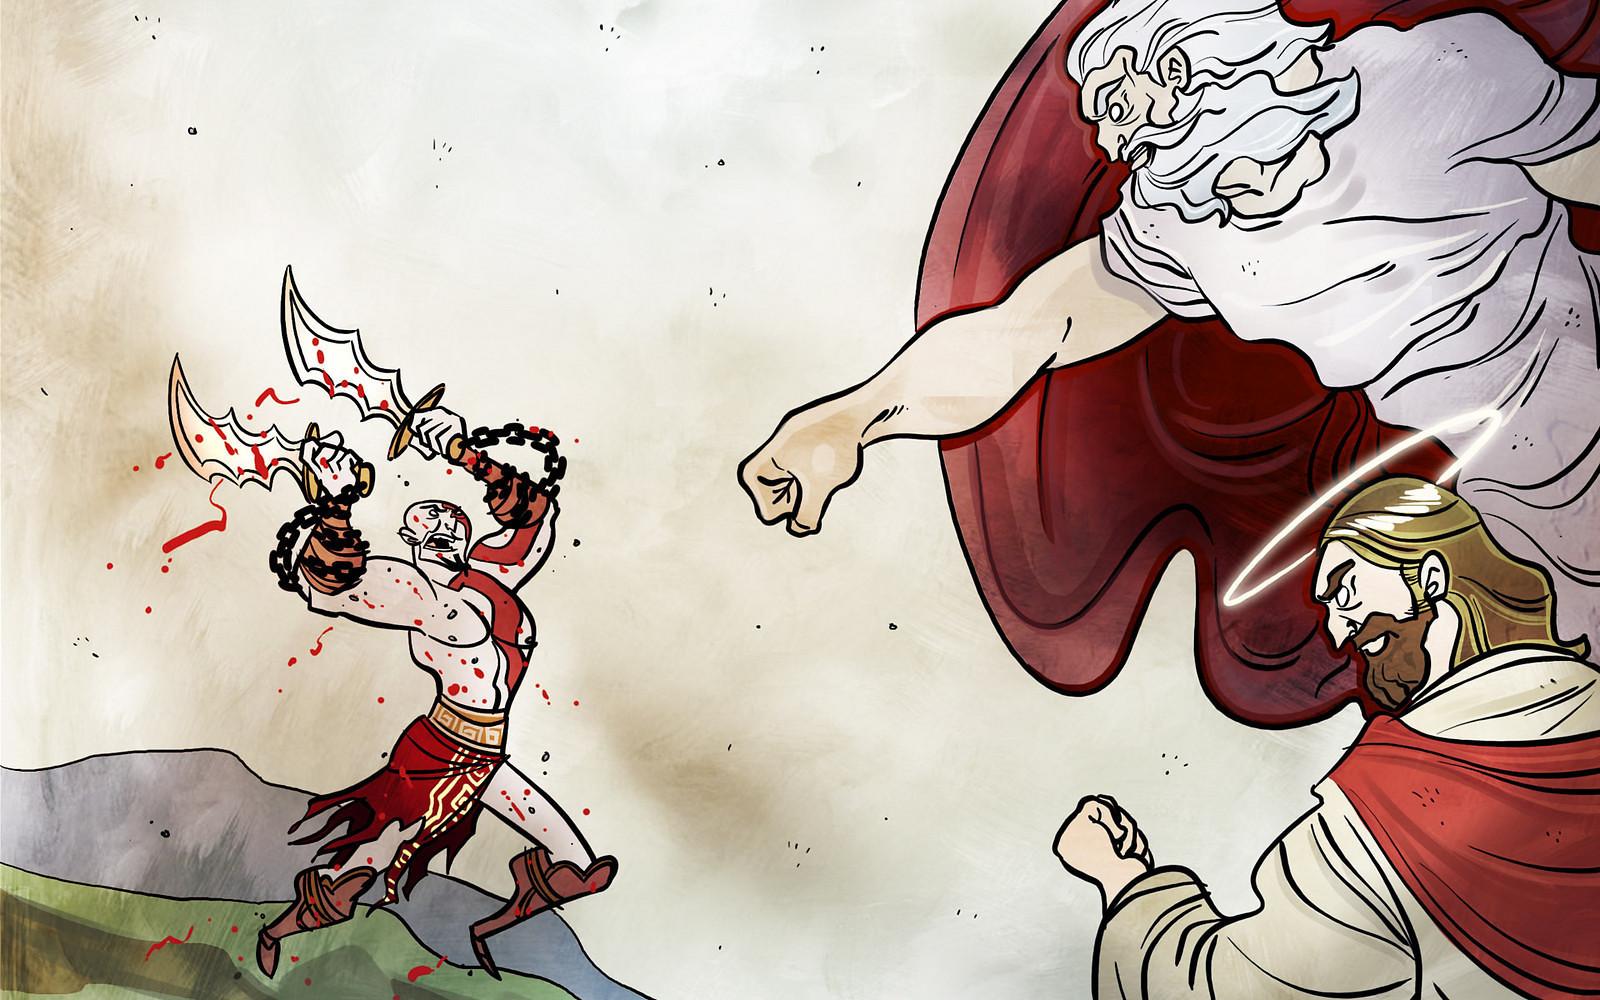 Kratos_vs._God_and_Jesus.jpg